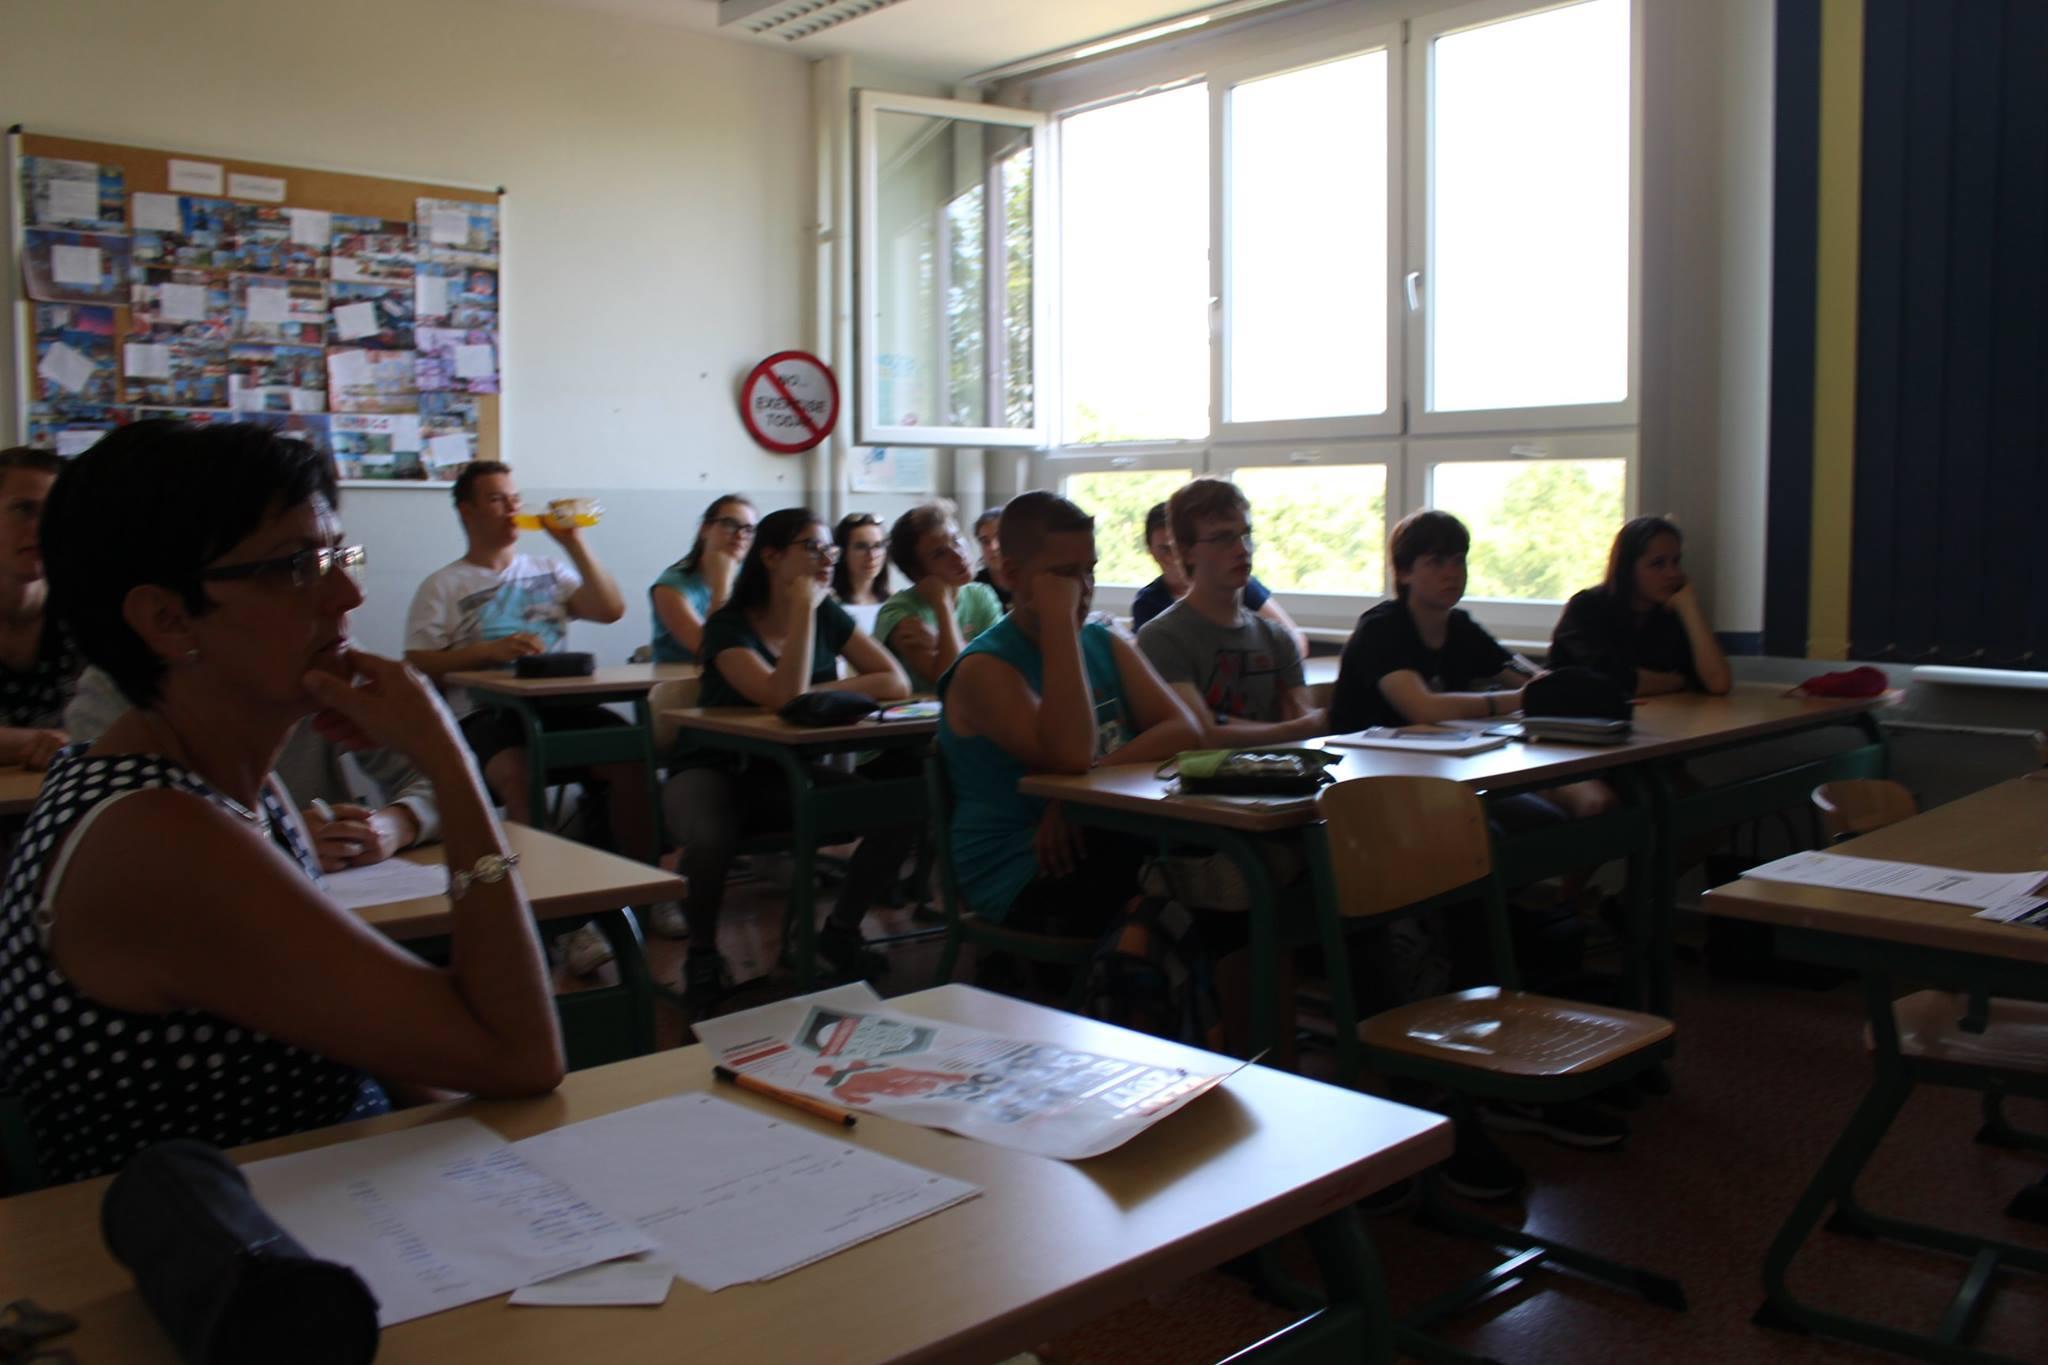 Summer School GERMANY-VISIT HHG_Erfurt_(21.06.2017)_photo2